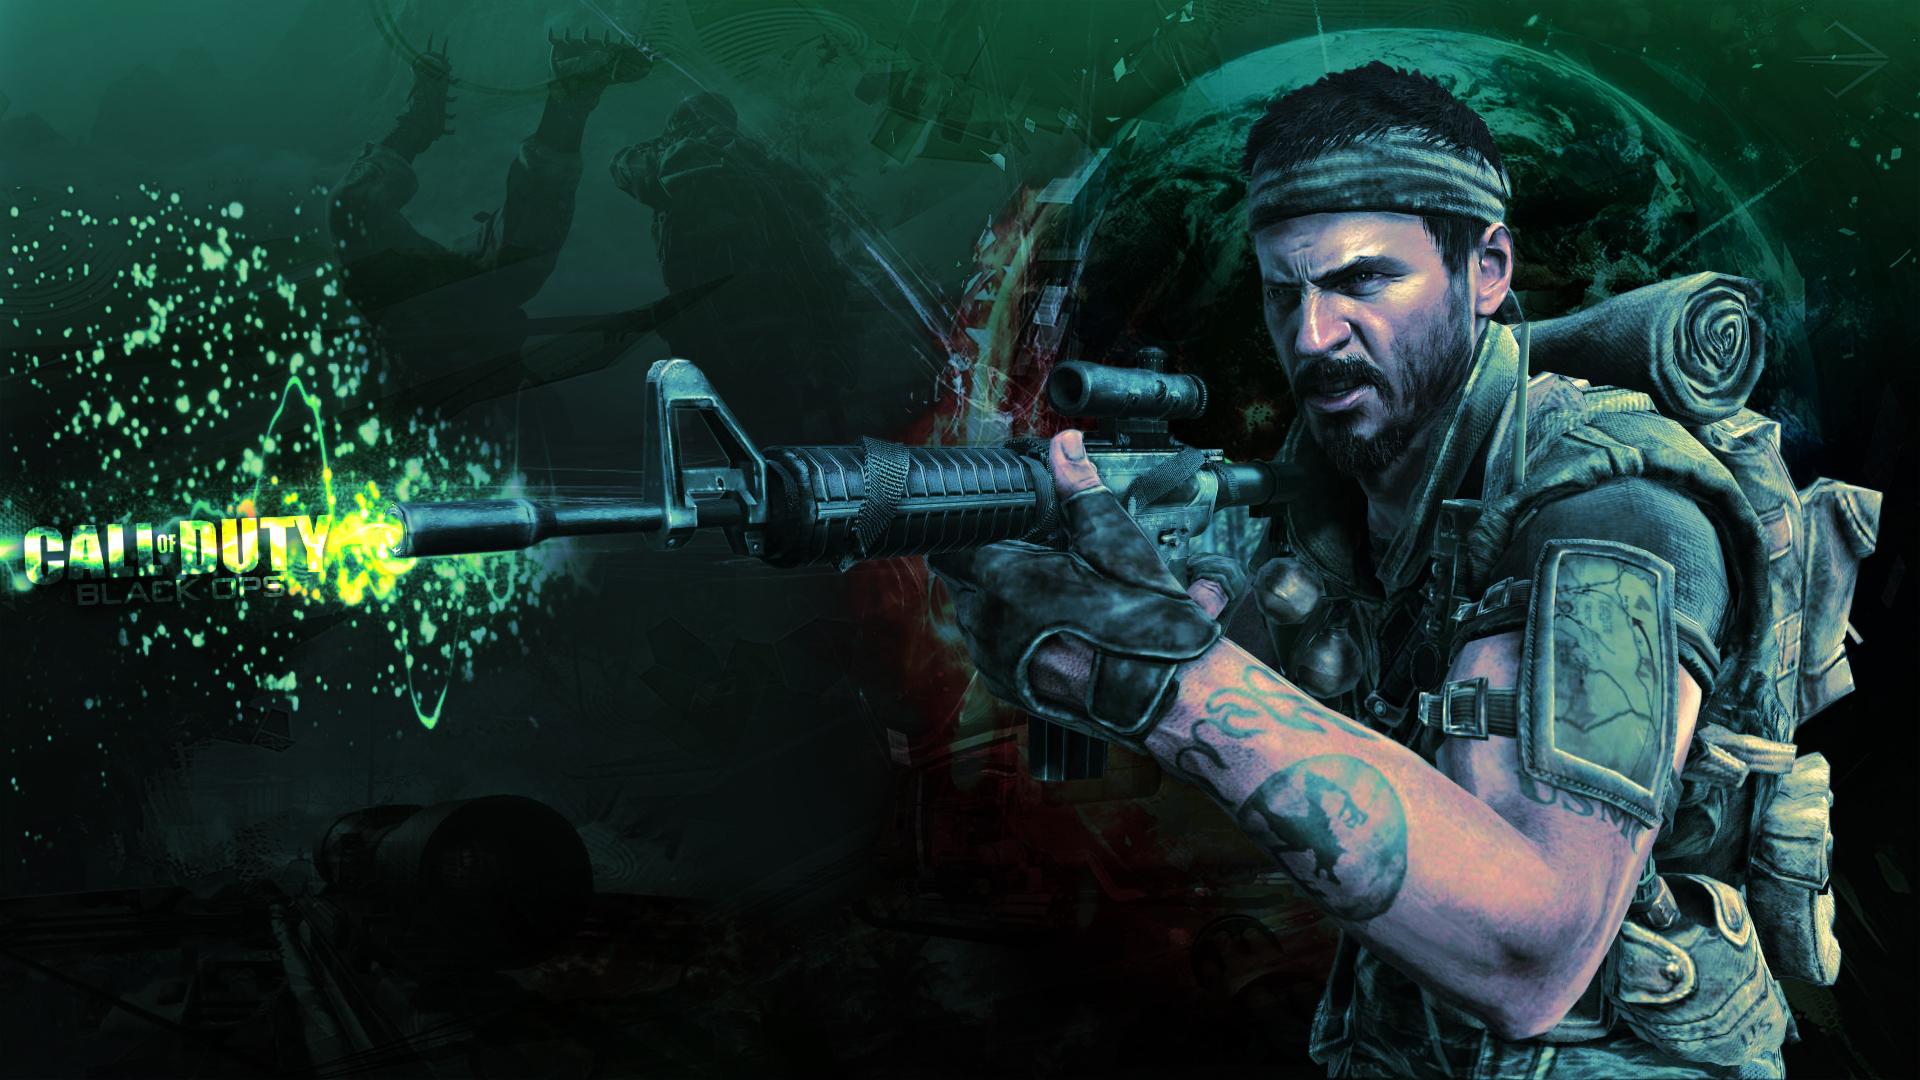 Duty Black Ops 1080p Wallpaper Call of Duty Black Ops 720p Wallpaper 1920x1080